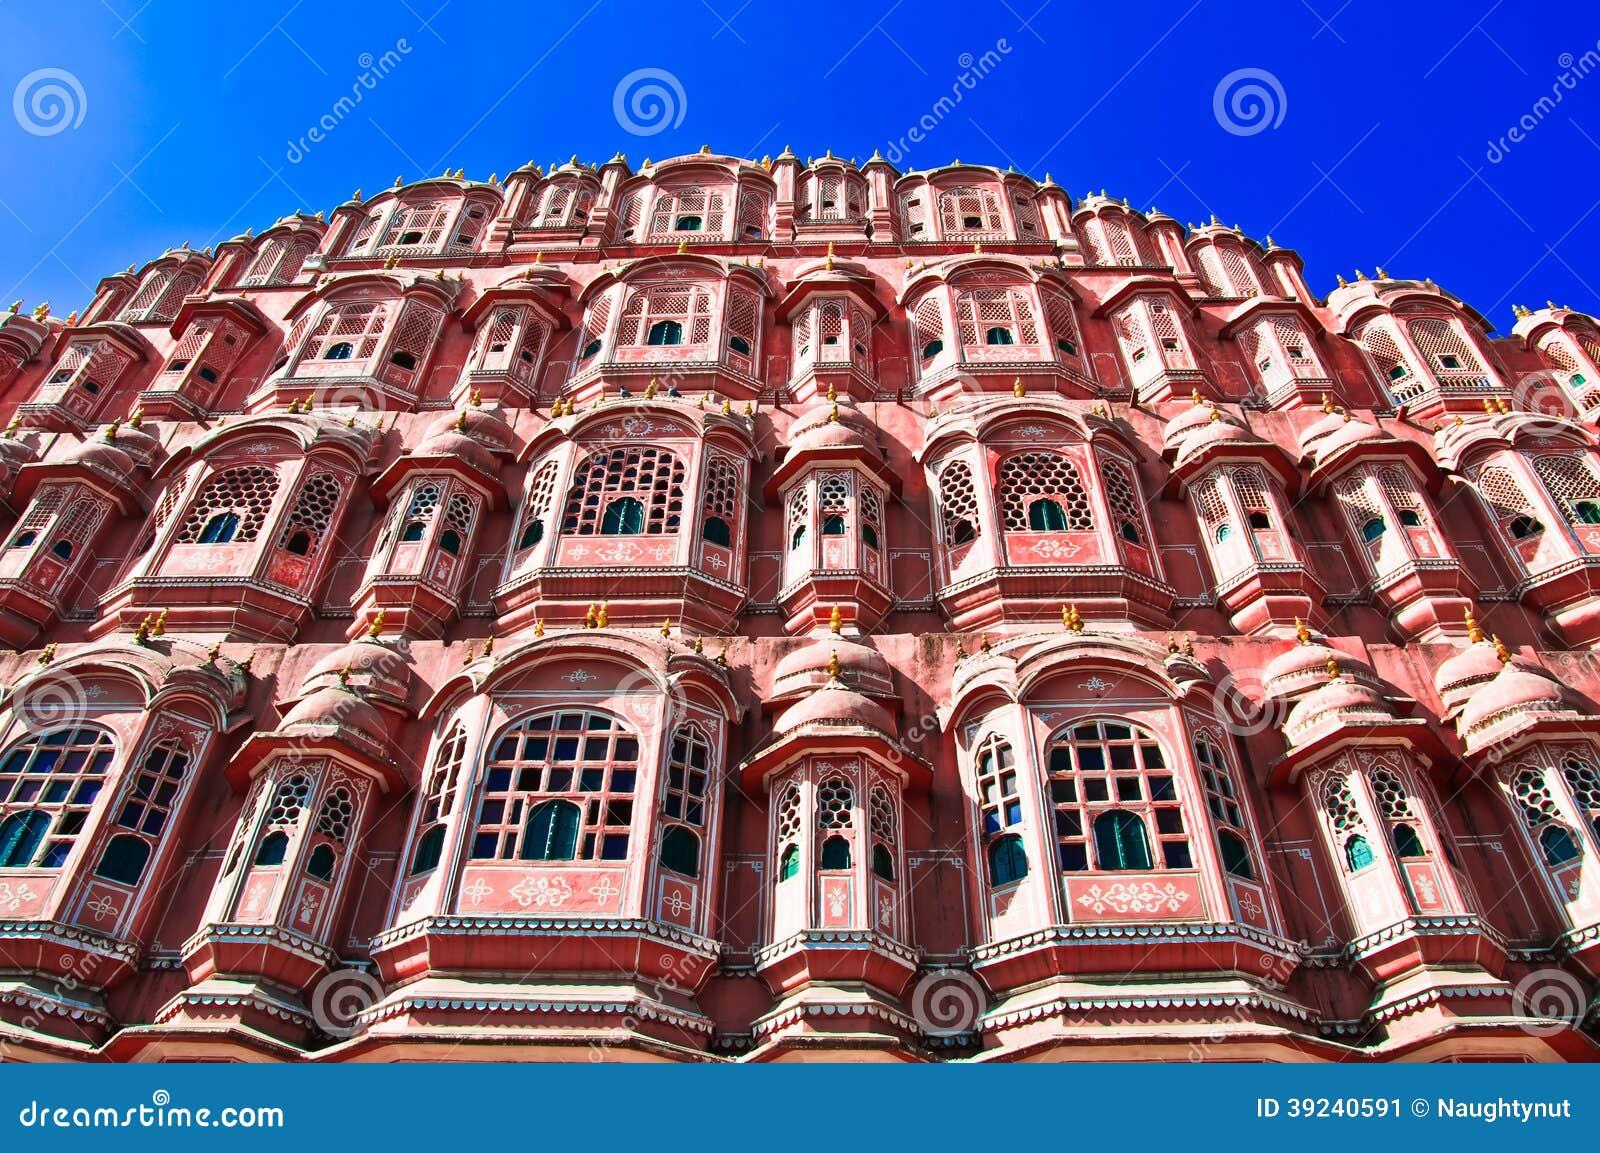 India. Rajasthan, Jaipur, Palace of Winds